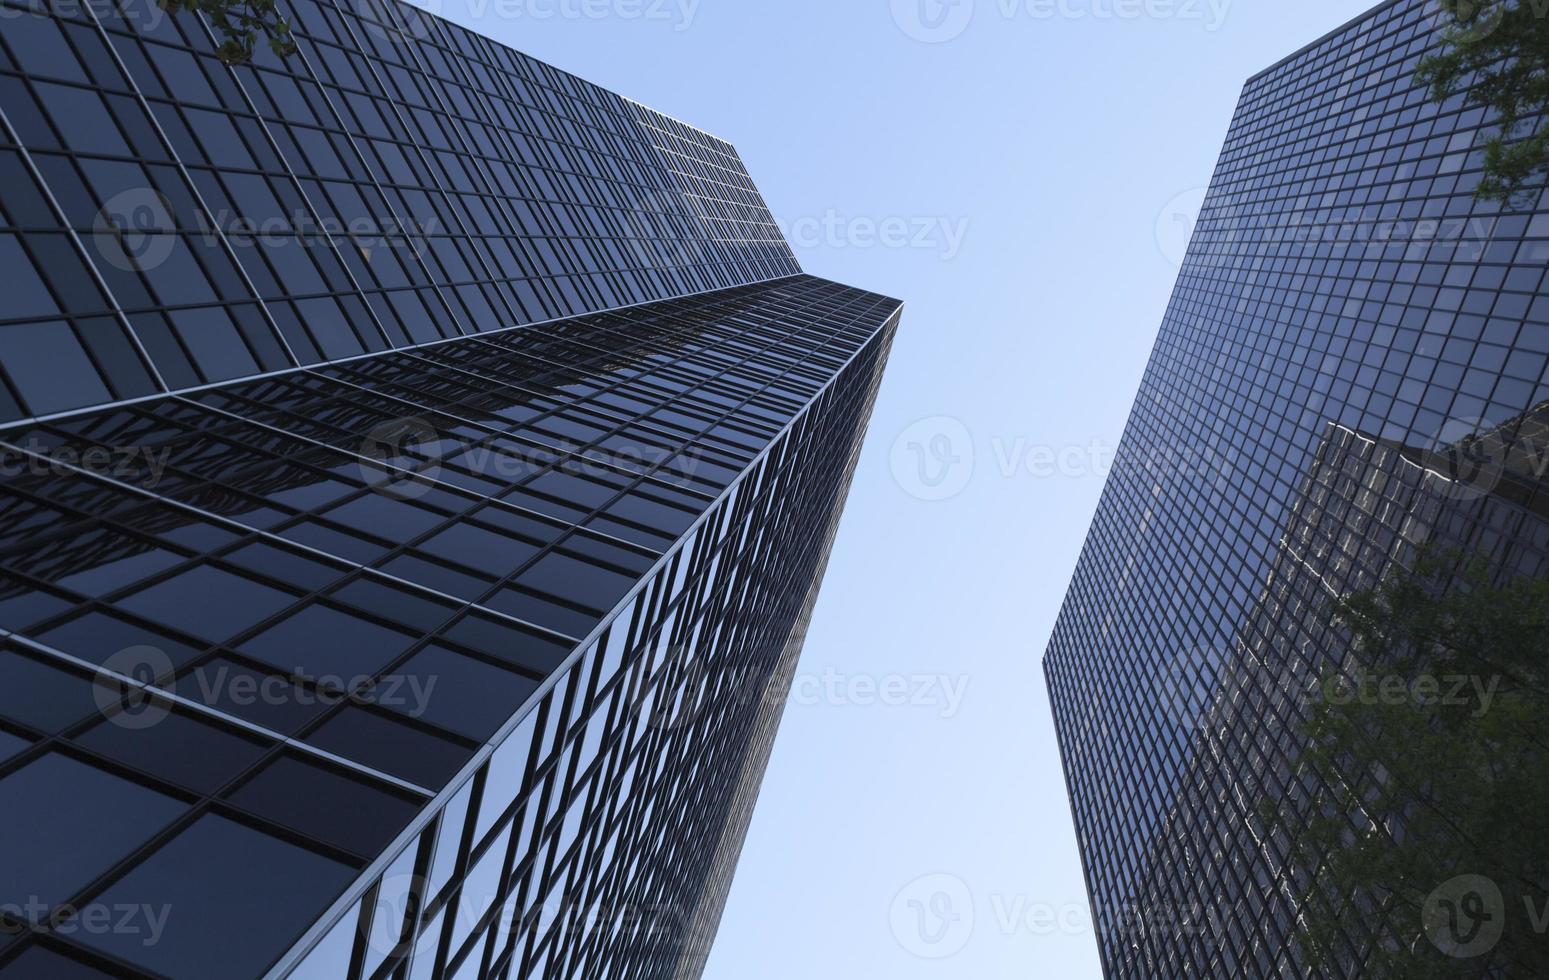 moderne Bürotürme aus Stahl und Glas unter blauem Himmel foto